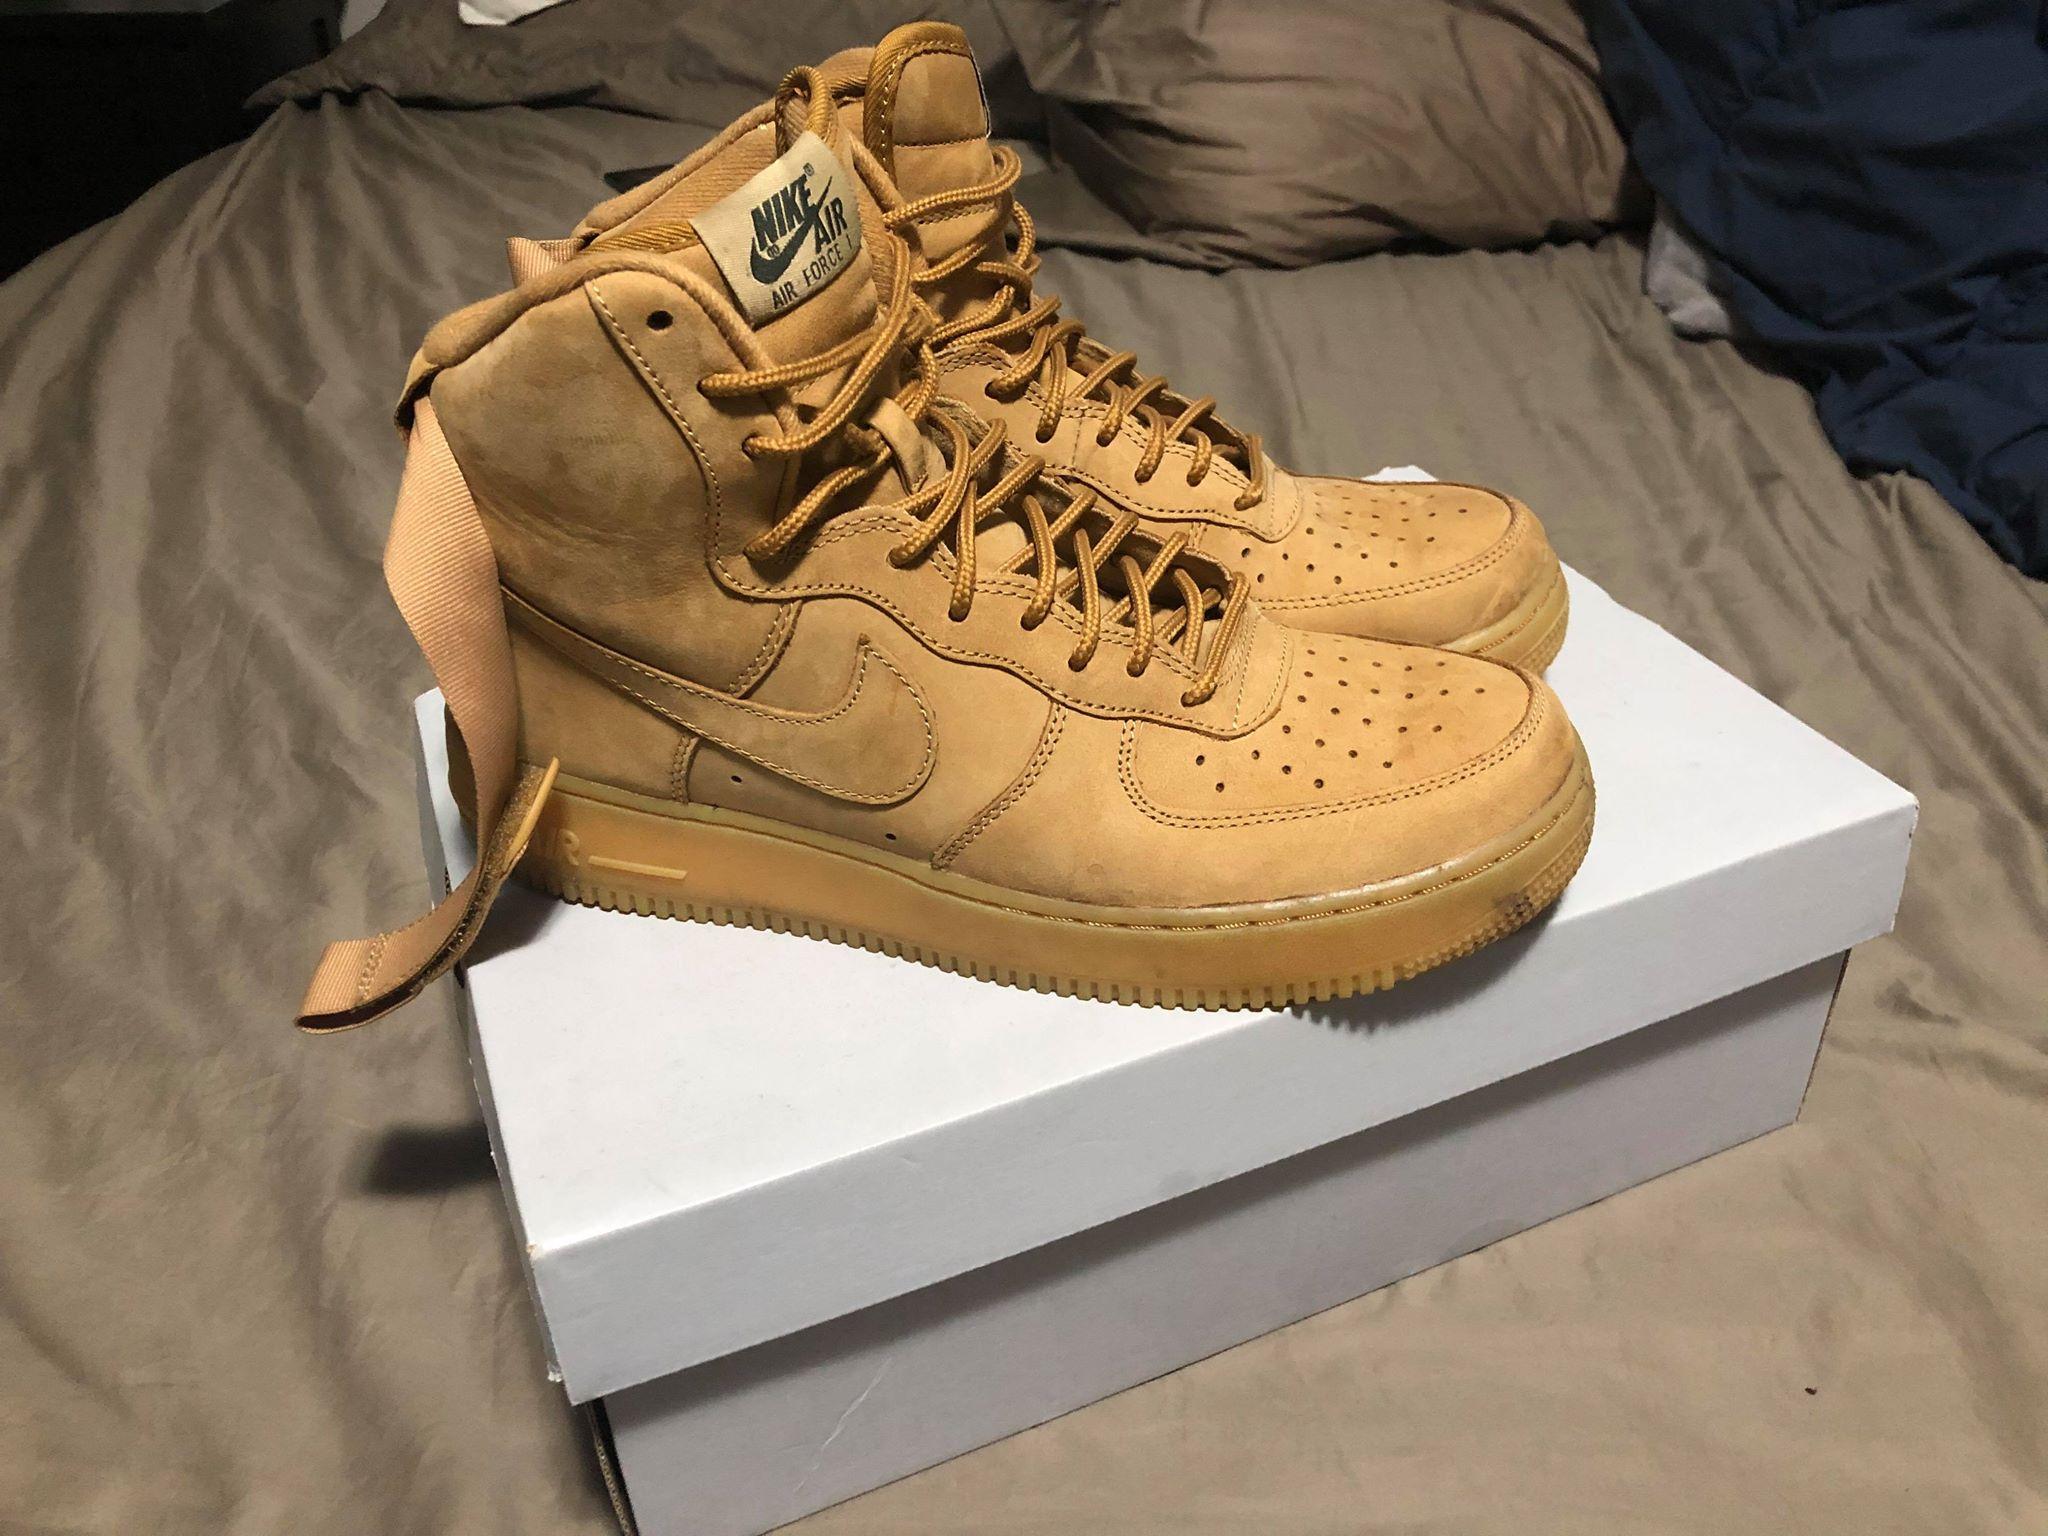 Cementerio Soportar fenómeno  Nike Nike Af1 Air Force 1 High Wheat Flax | Grailed